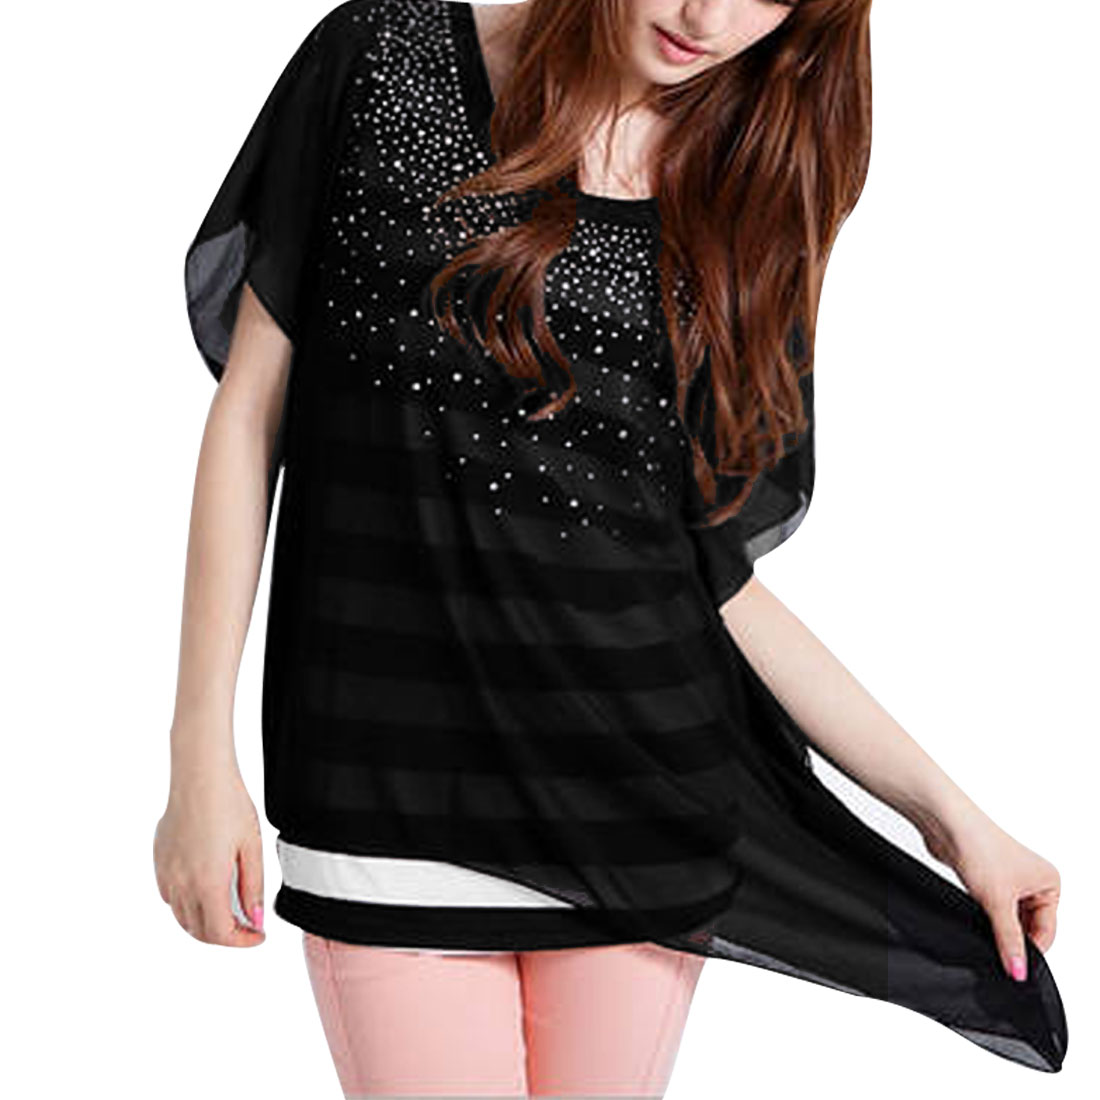 Lady Black Rhinestone Decor Round Neck Layered Shirts Shirt Top XS